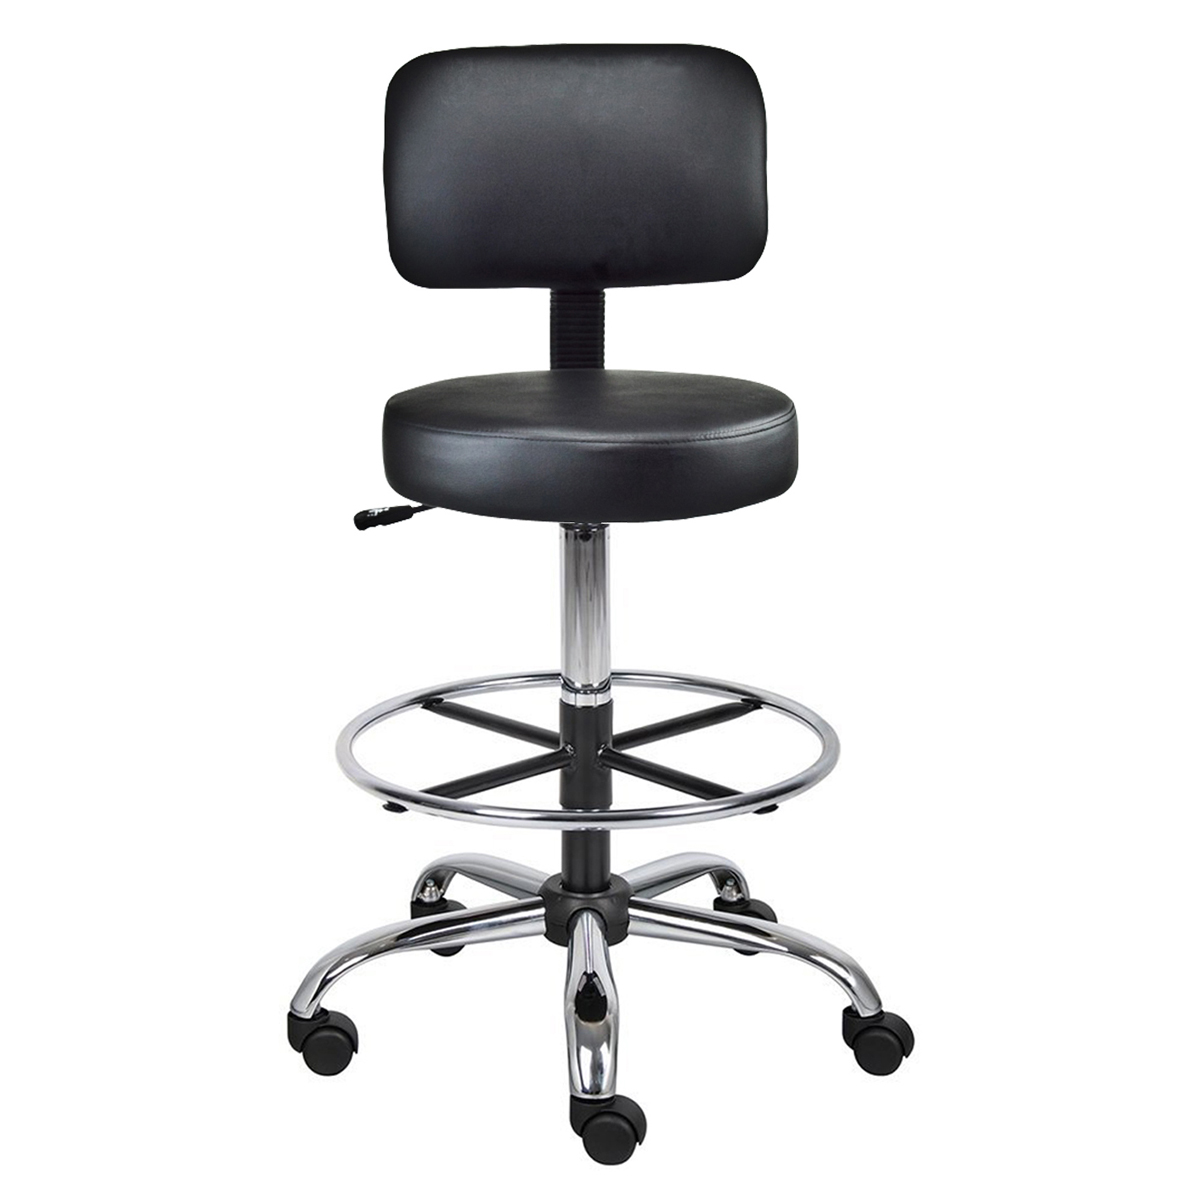 stool chair facial salon tattoo beauty drafting salon leather ebay